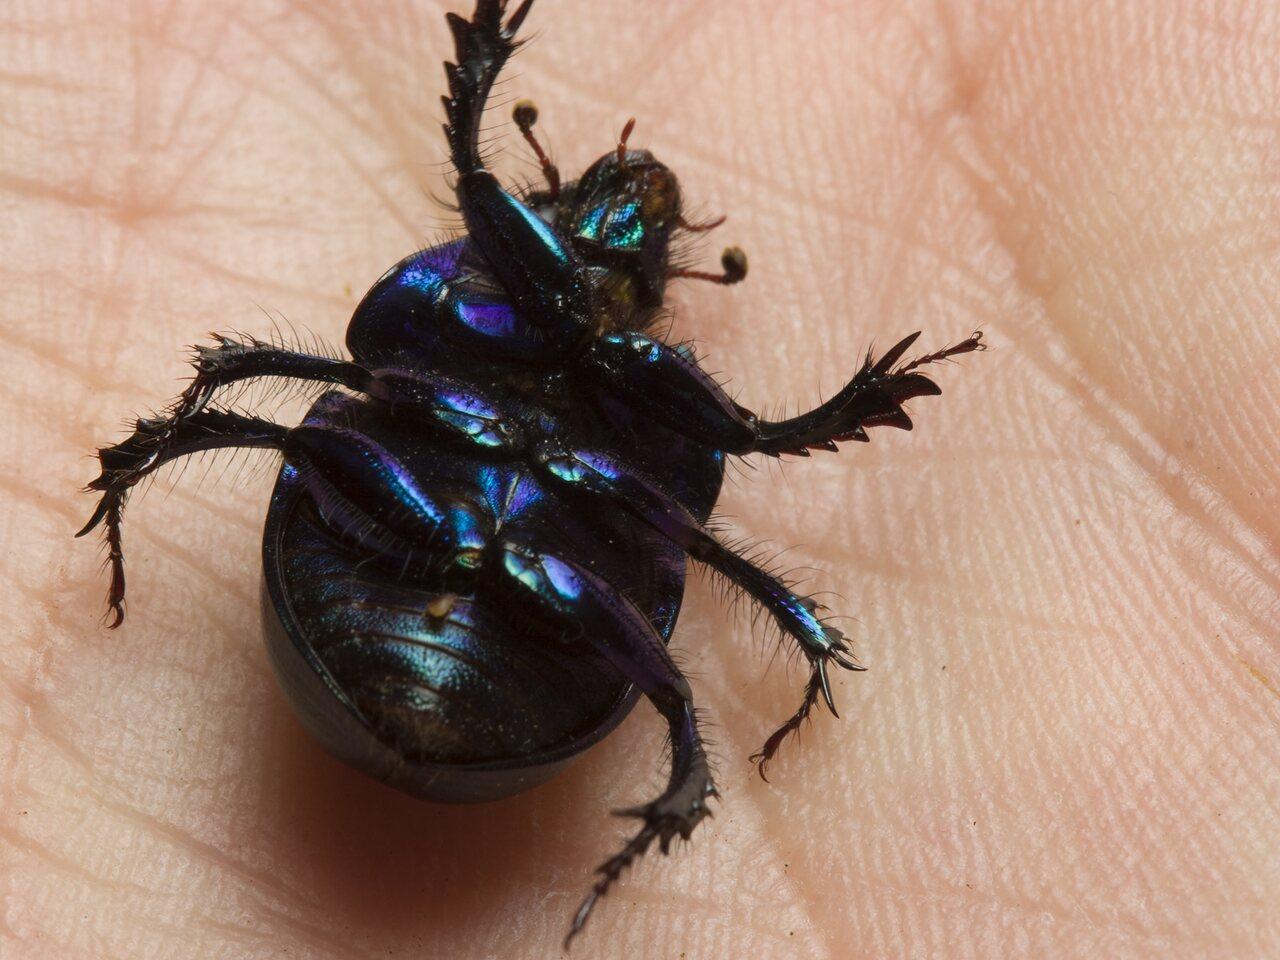 Anoplotrupes-stercorosus-0815.jpg